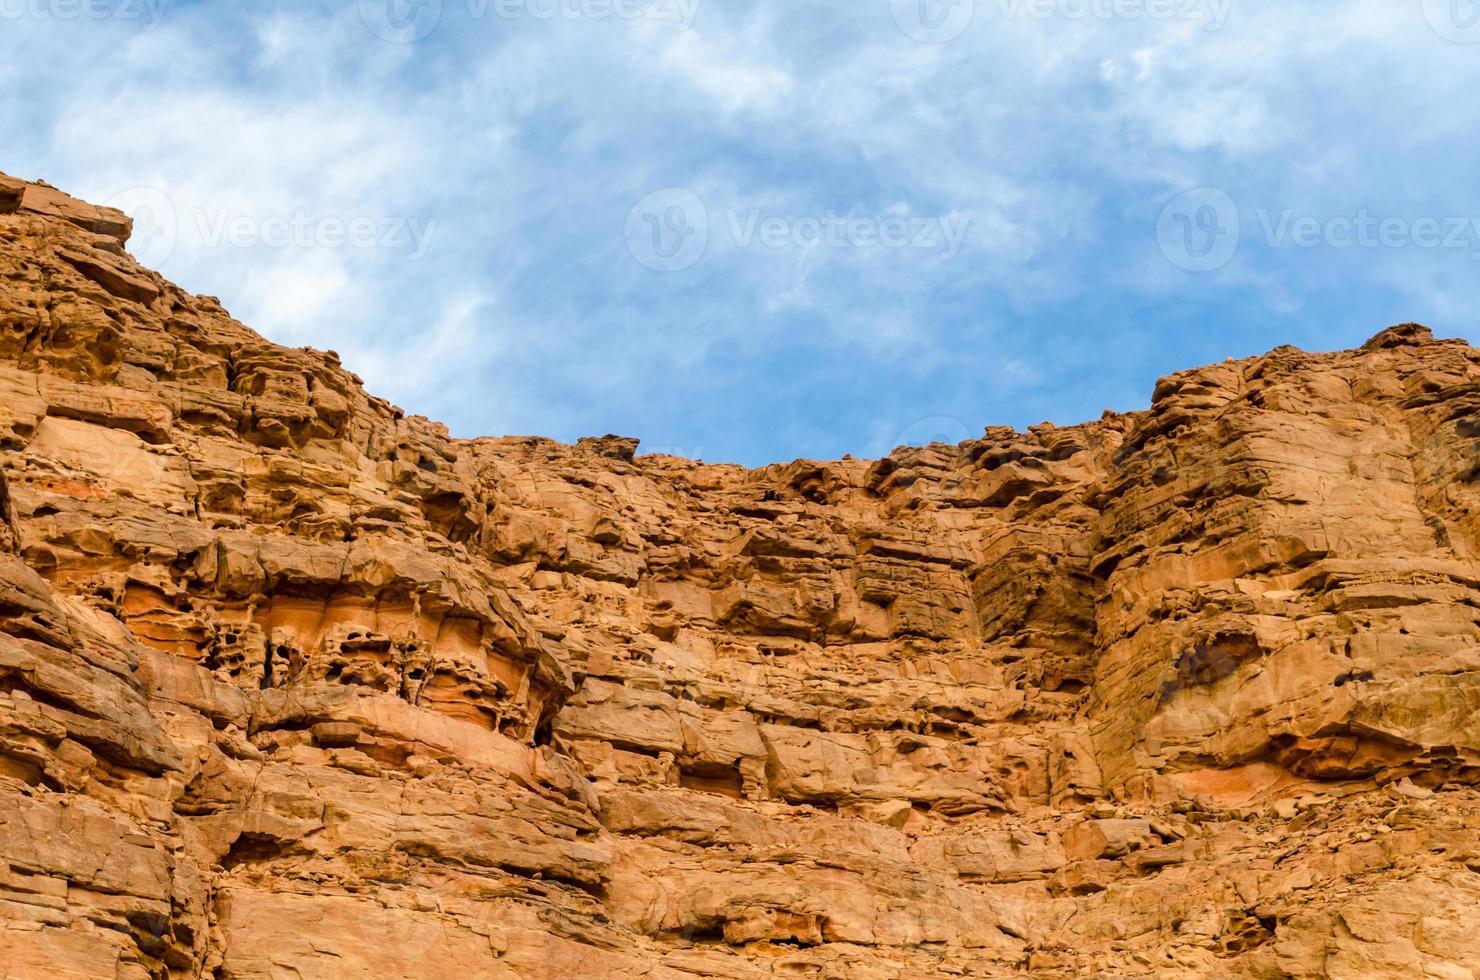 blauwe lucht boven een rotsachtige canyon foto